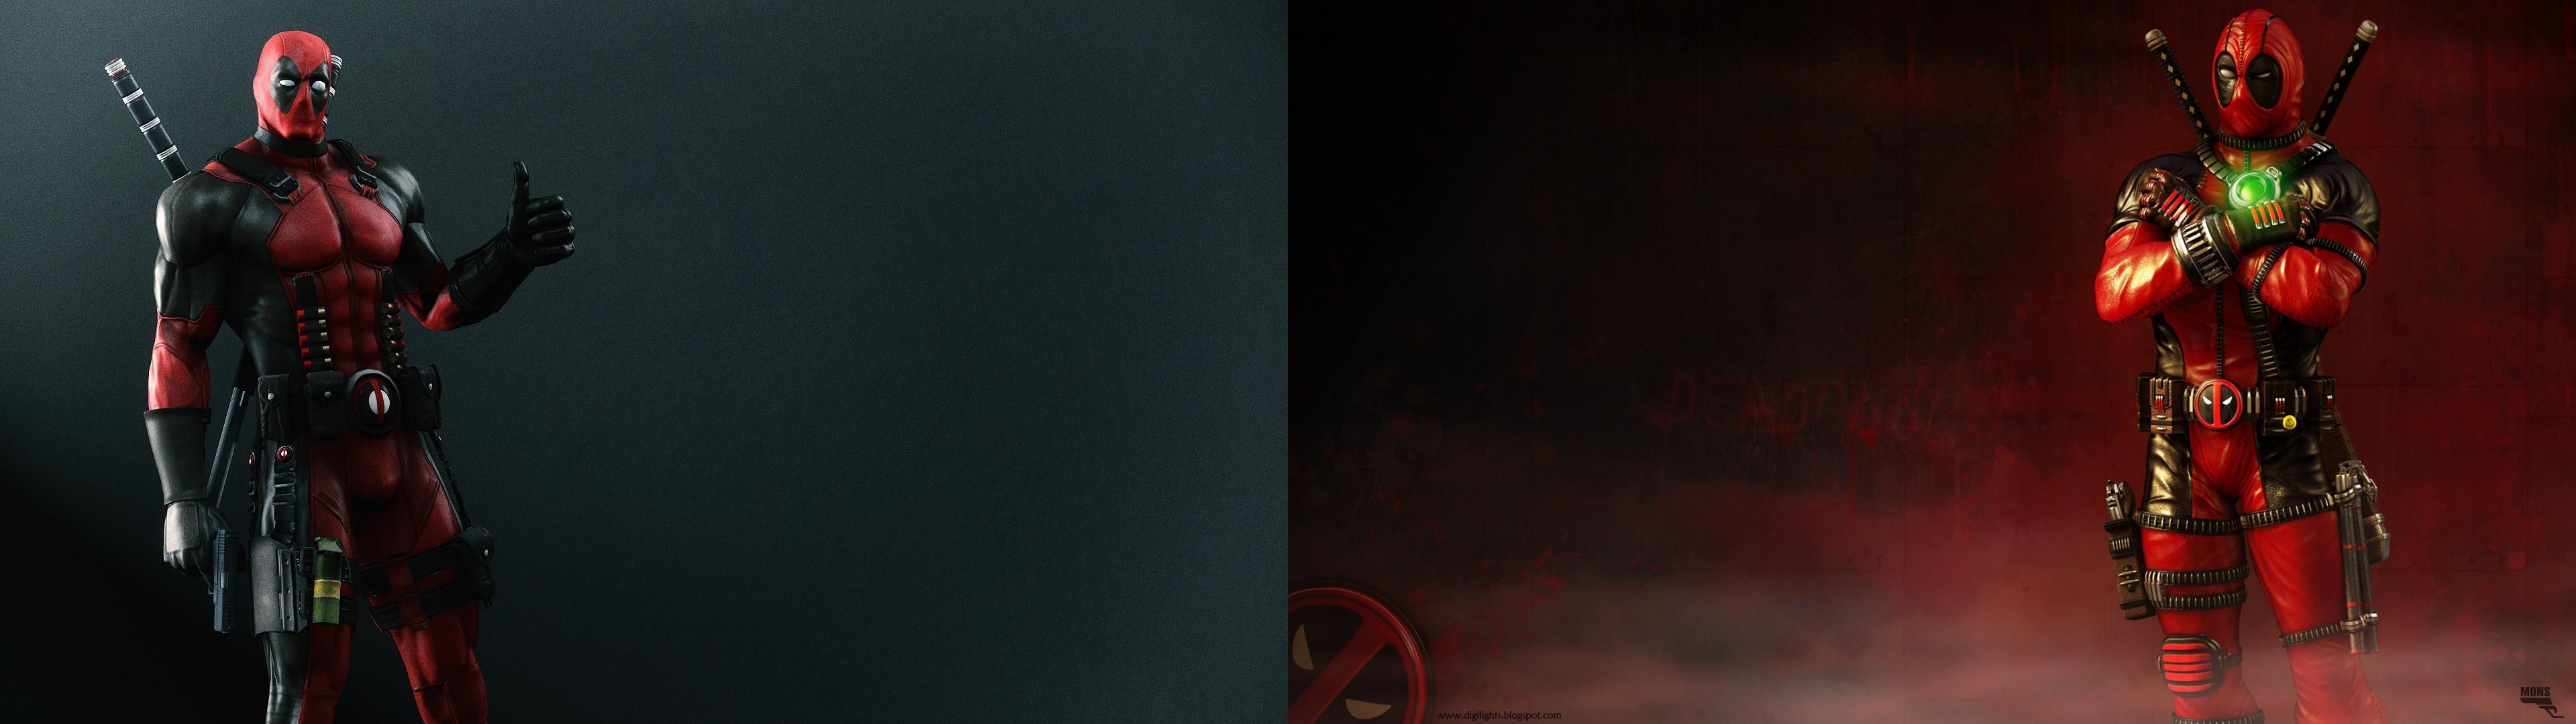 Dual Monitor Video Game 3840x1080 Wallpaper Teahub Io